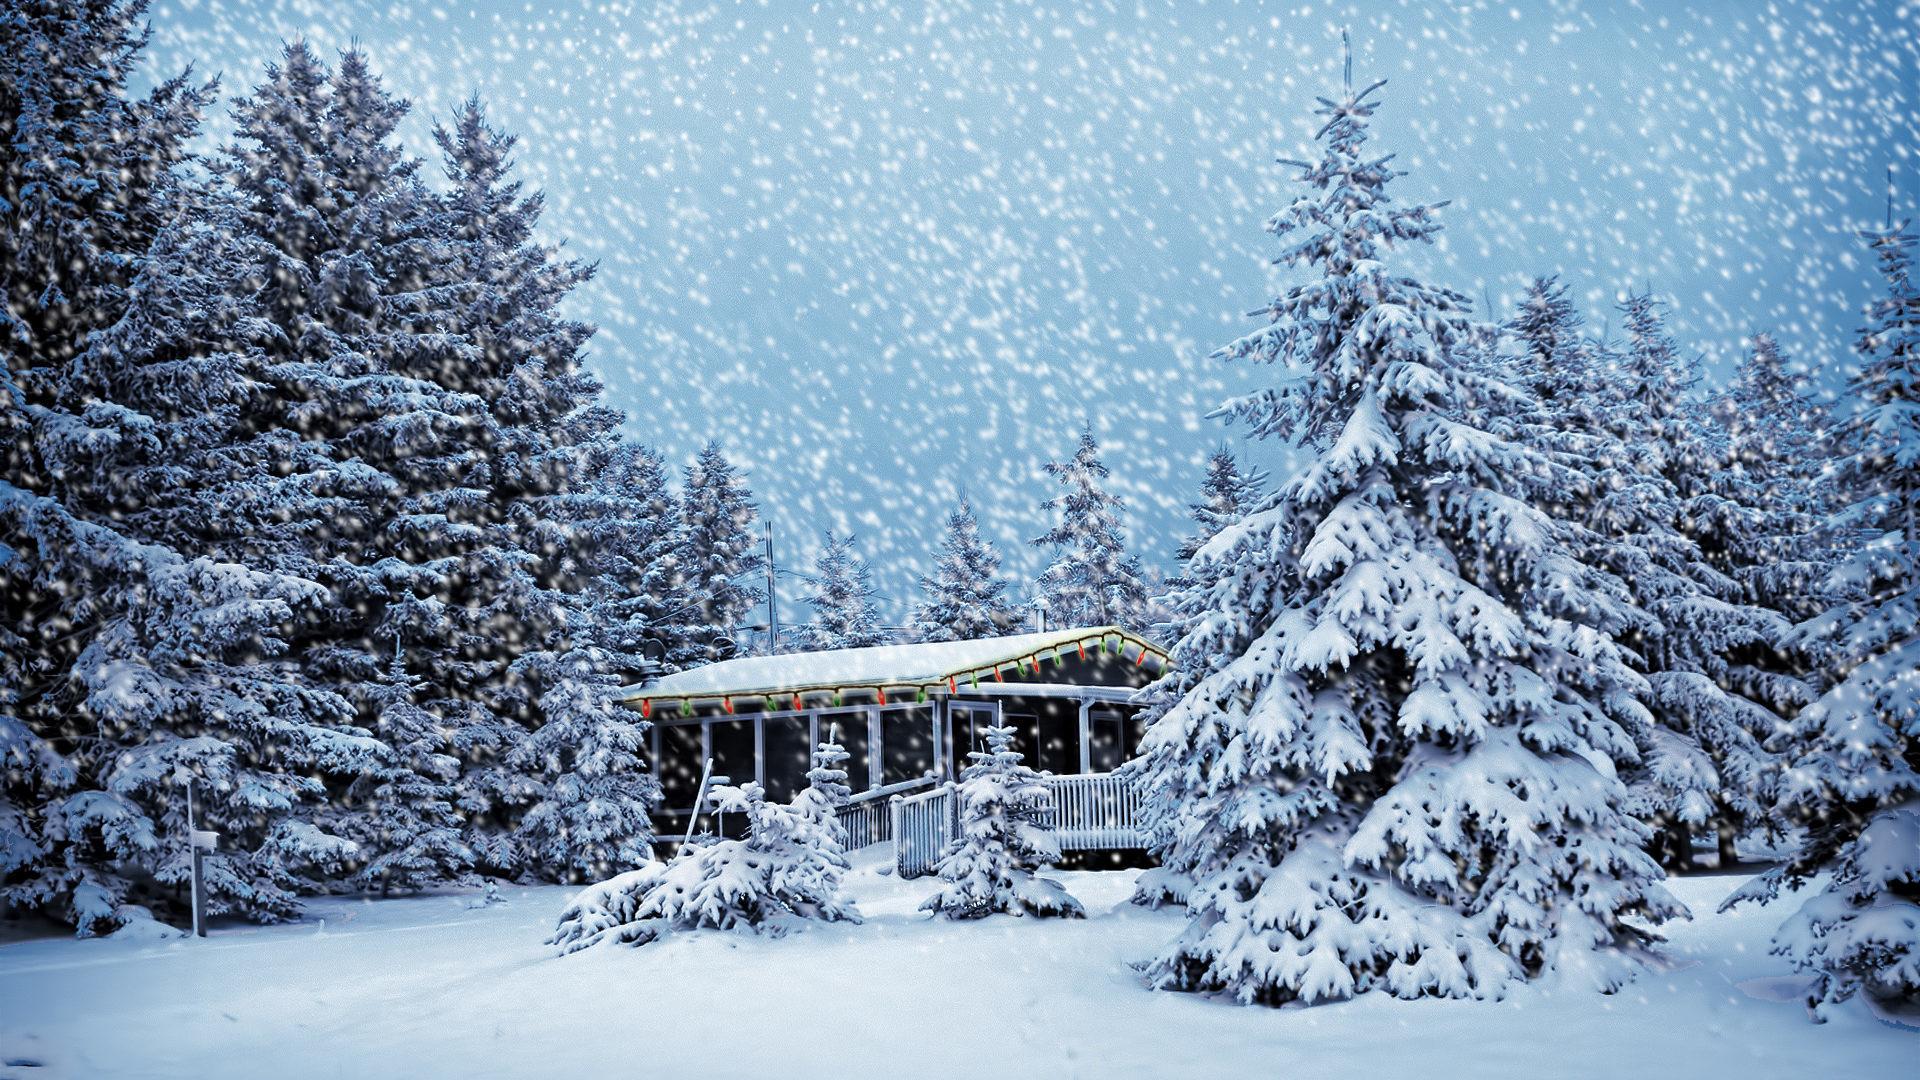 … winter scenes wallpaper free the wallpaper; winter tree snow …